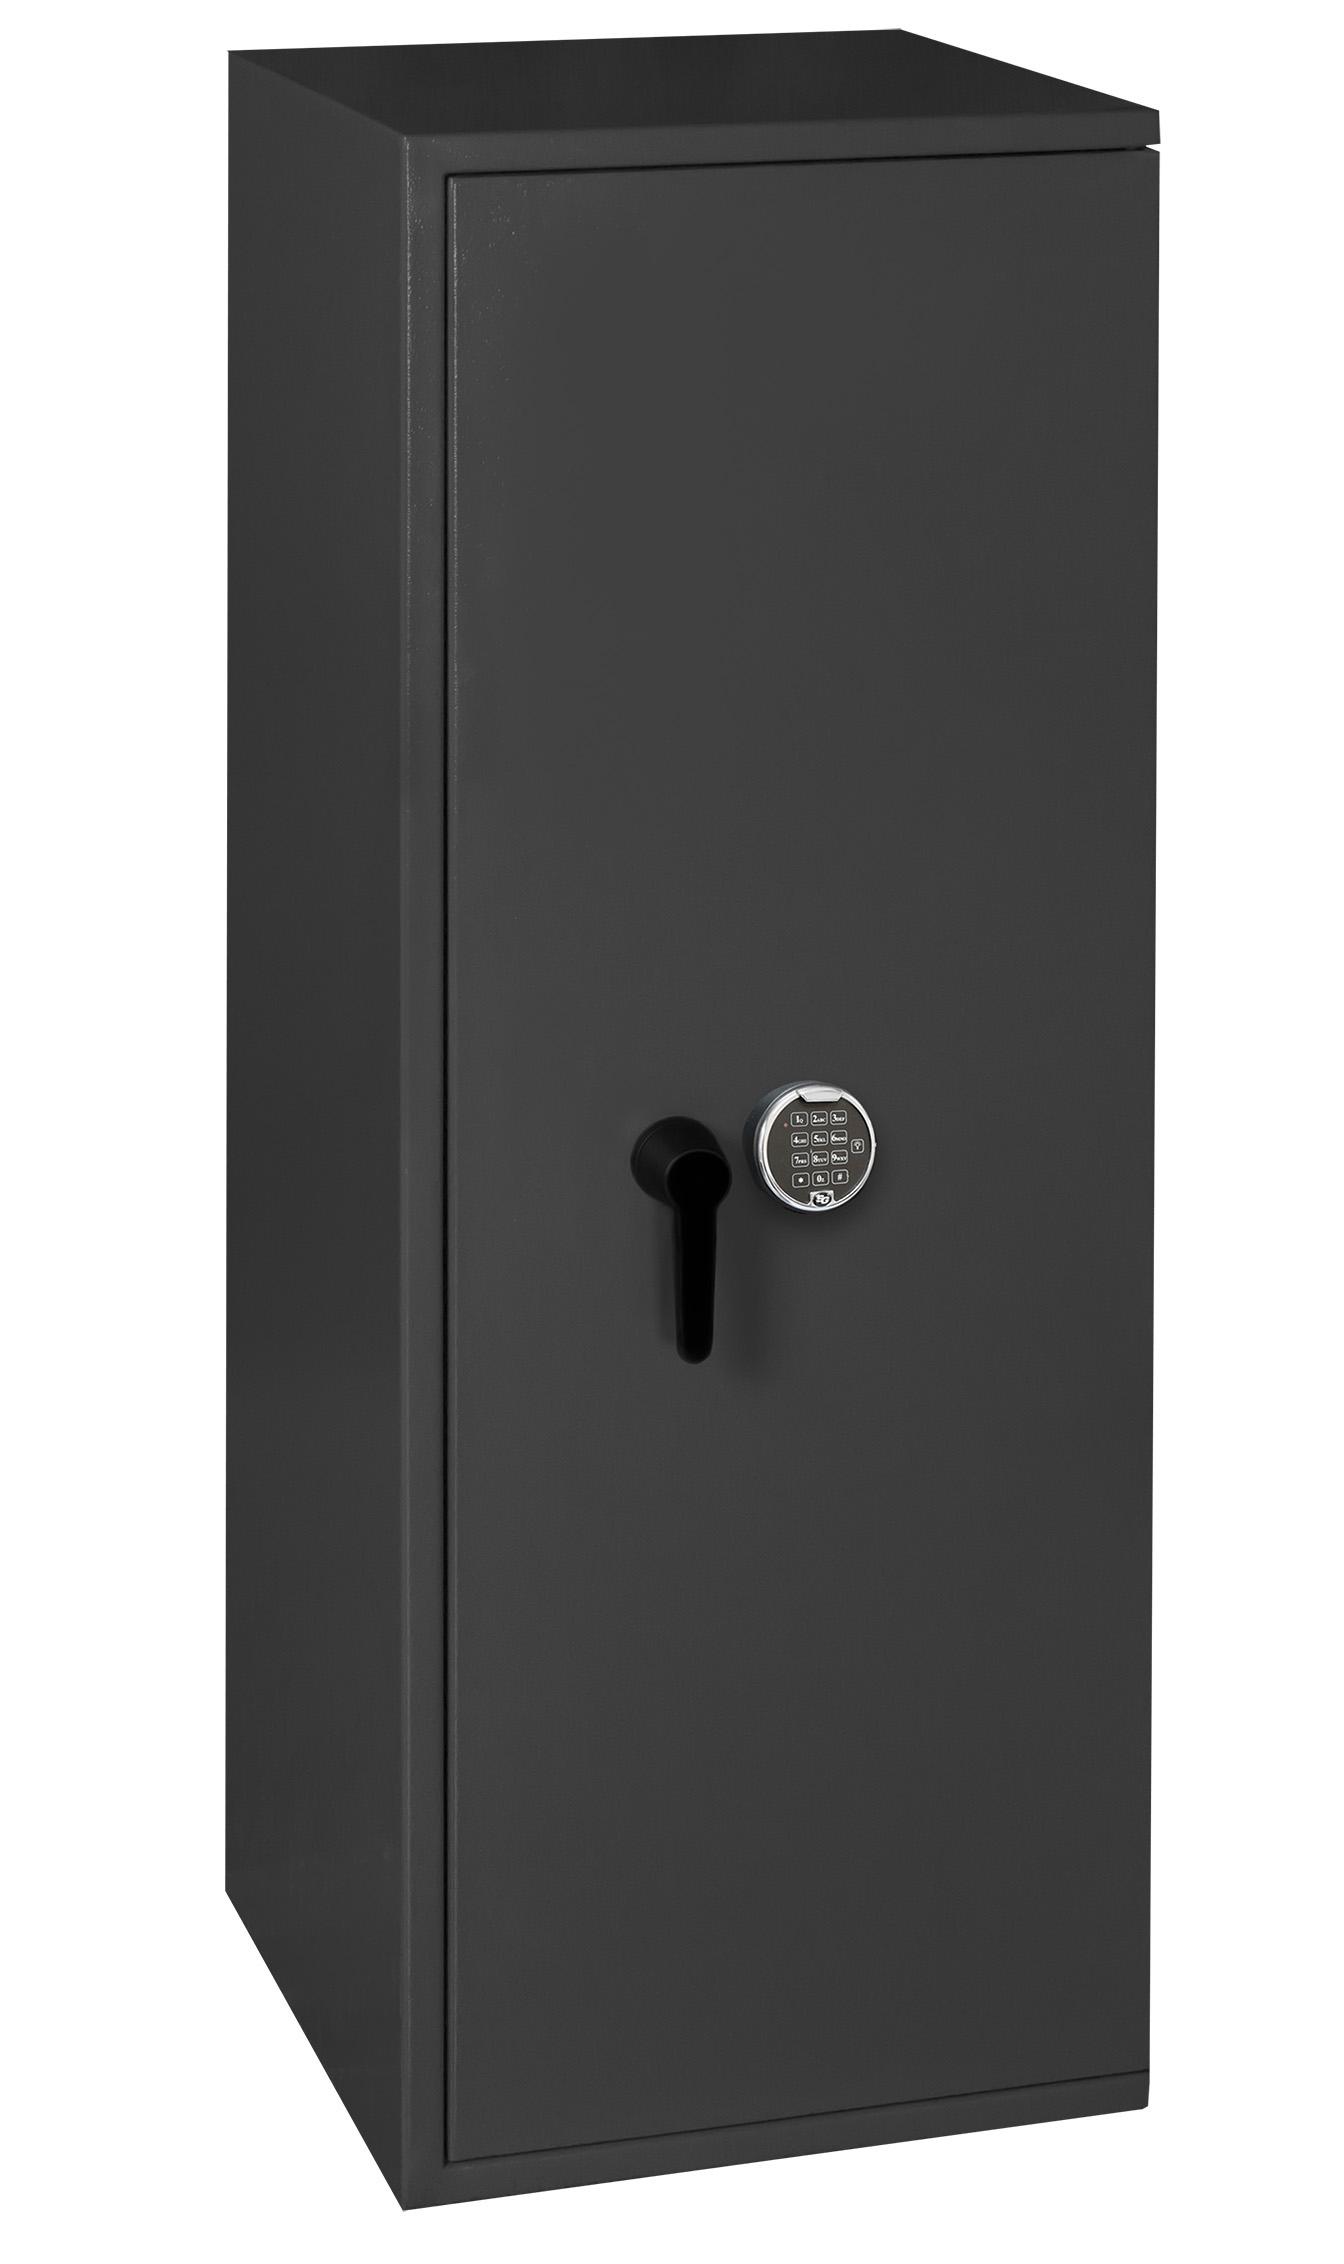 waffenschrank grad 0 1 en 1143 1 gun safe 1 8 mit zahlenschloss. Black Bedroom Furniture Sets. Home Design Ideas